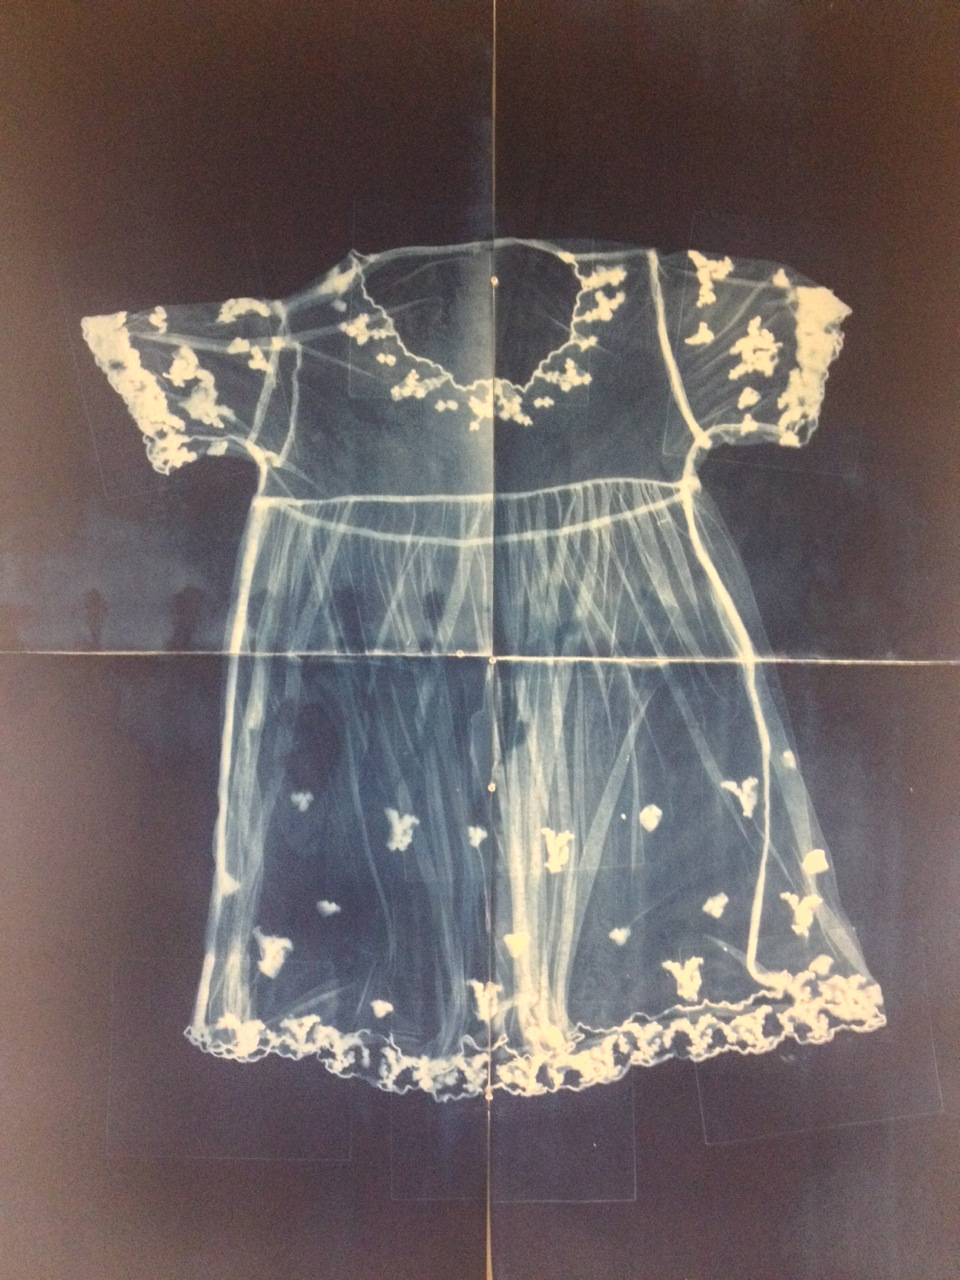 Mothers Dress (Four Parts) by J Gray Swartzel - Cyanotype - 44 x 60 - framed: 2014